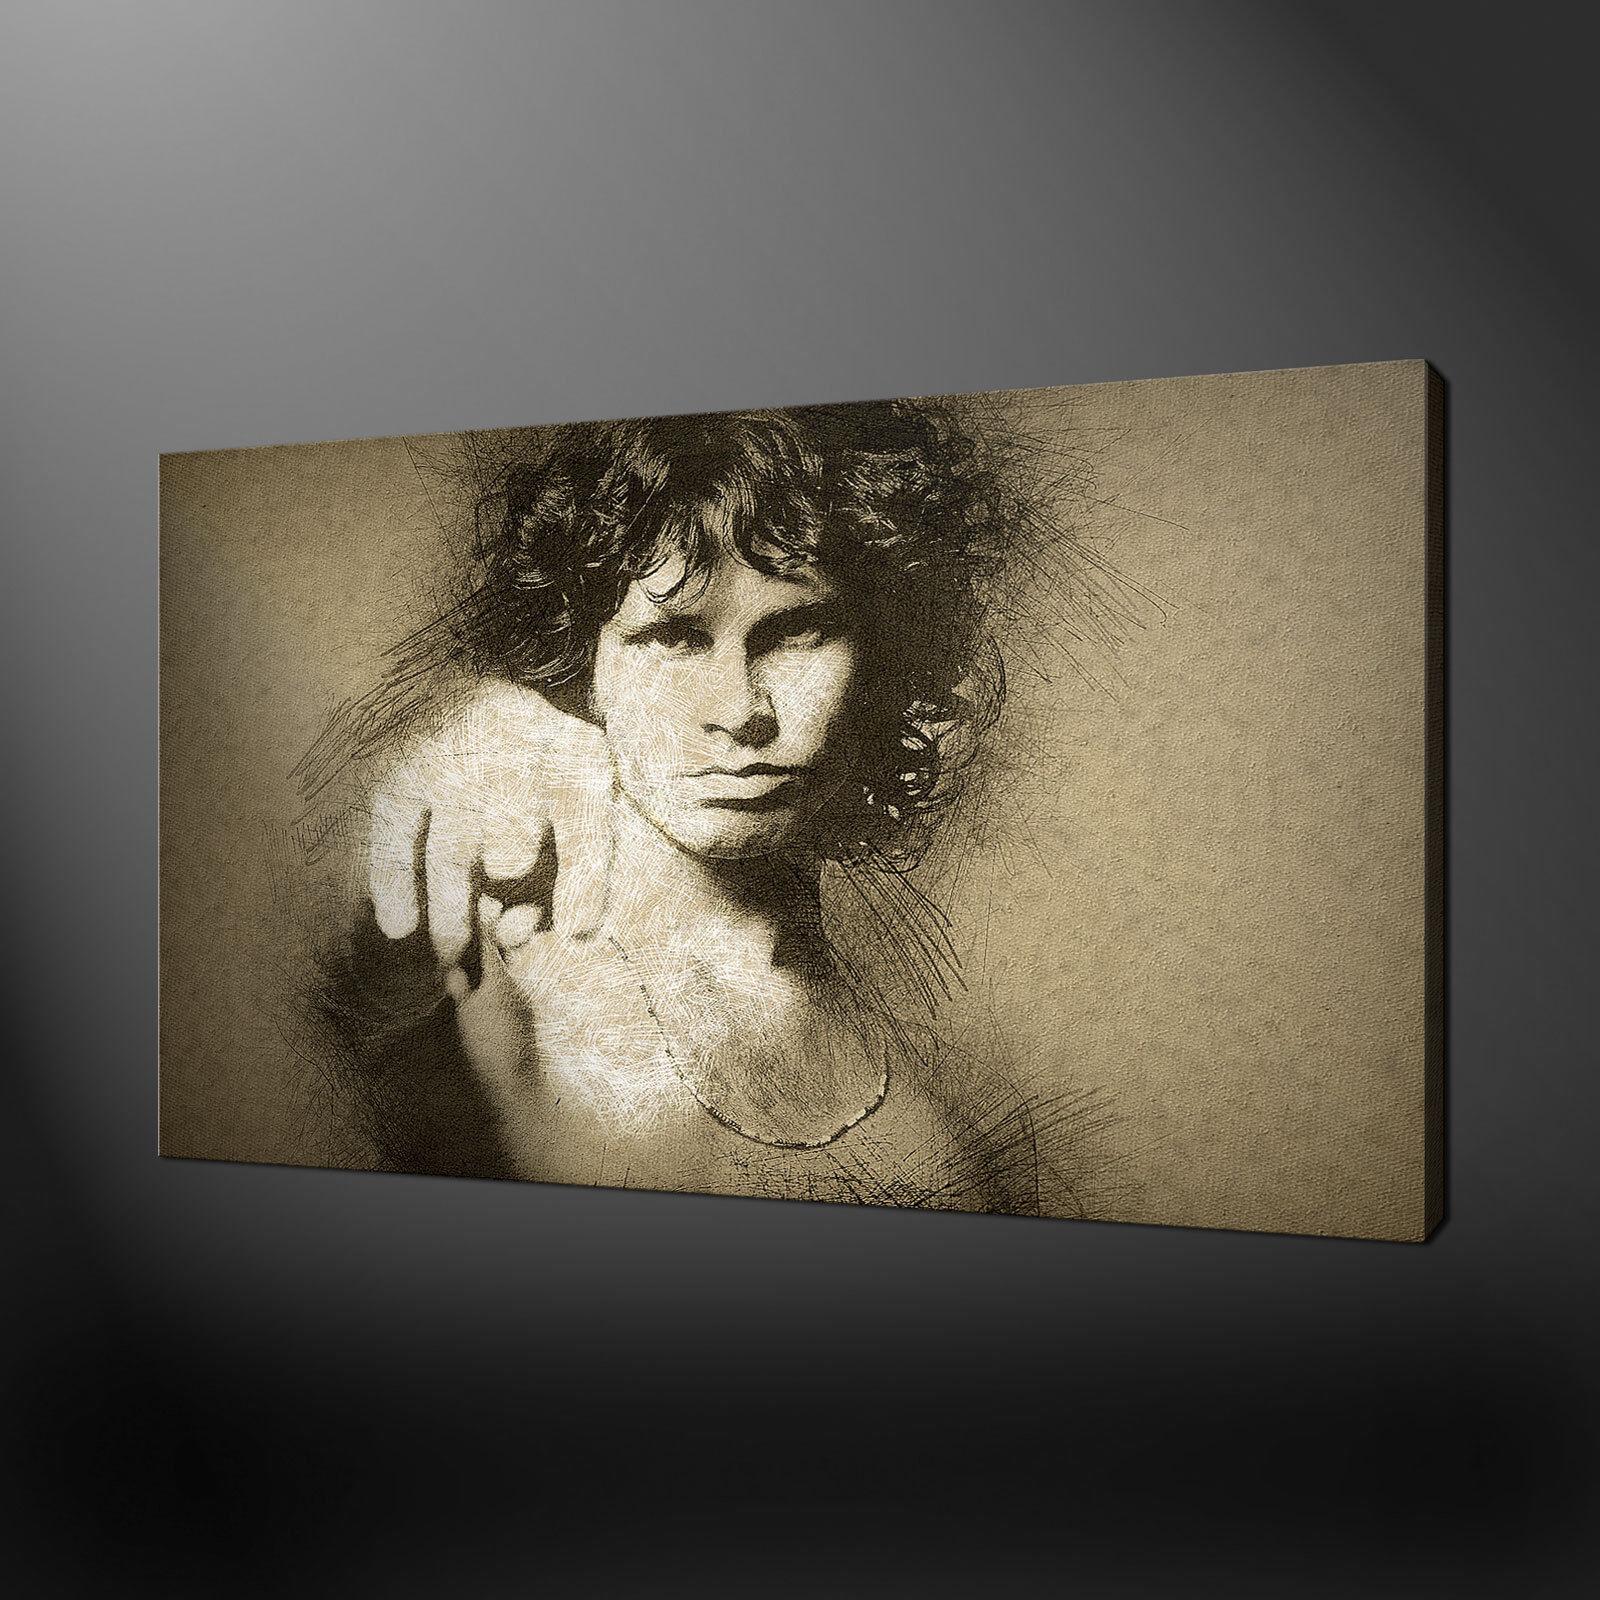 JIM MORRISON MUSICA icona stampa foto su tela Wall Art Free Fast UK Consegna